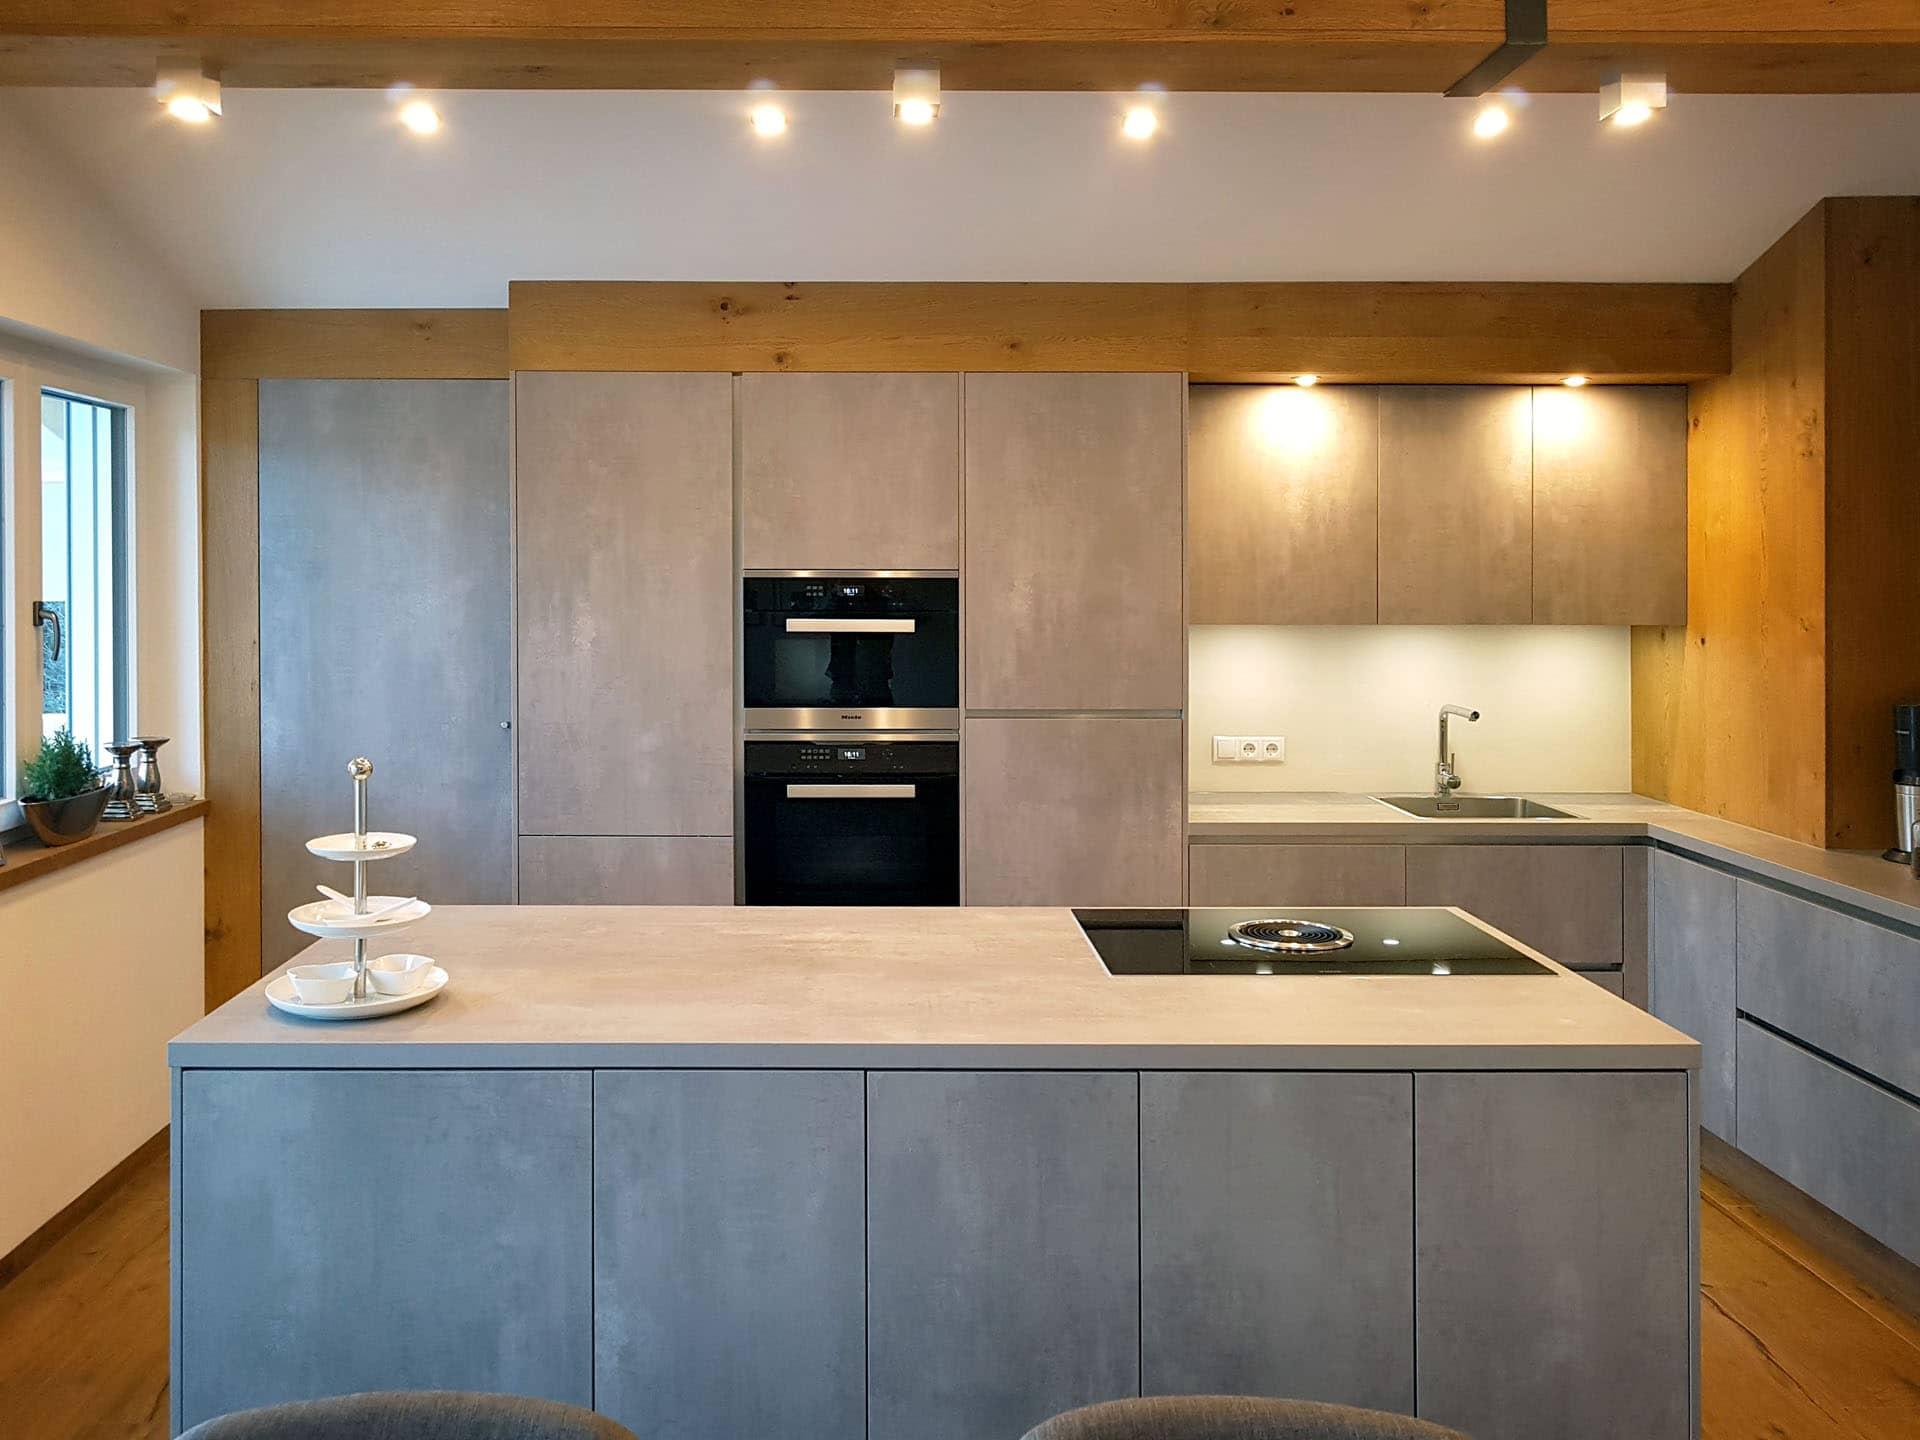 Kuche Betonoptik Holz Nischenruckwand Kuche Haus Renovieren